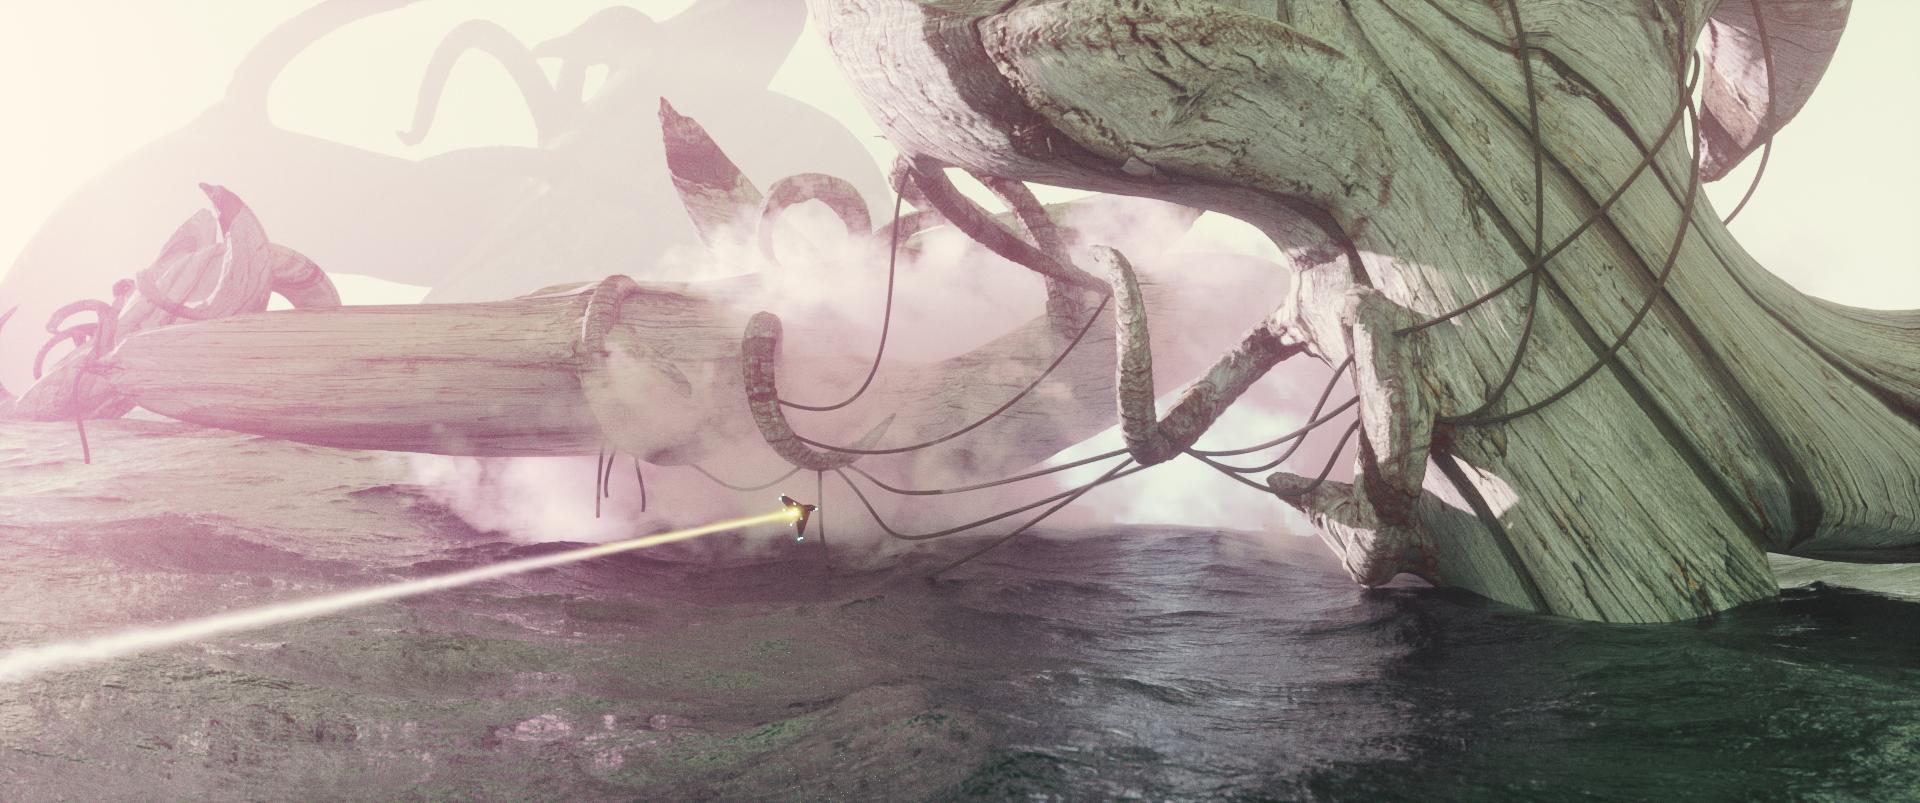 ocean_ropes_shot_01.jpg